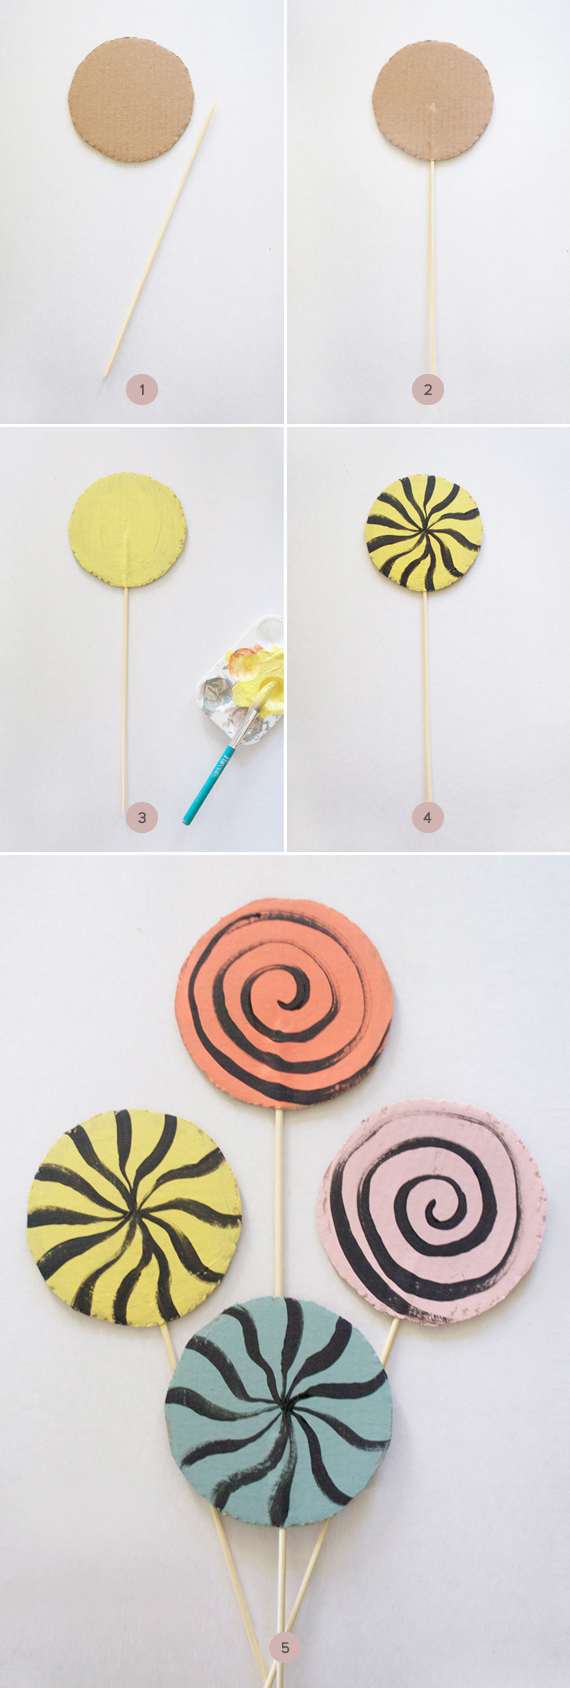 Diy Make A Set Of Play Lollipops Out Of Cardboard Julep